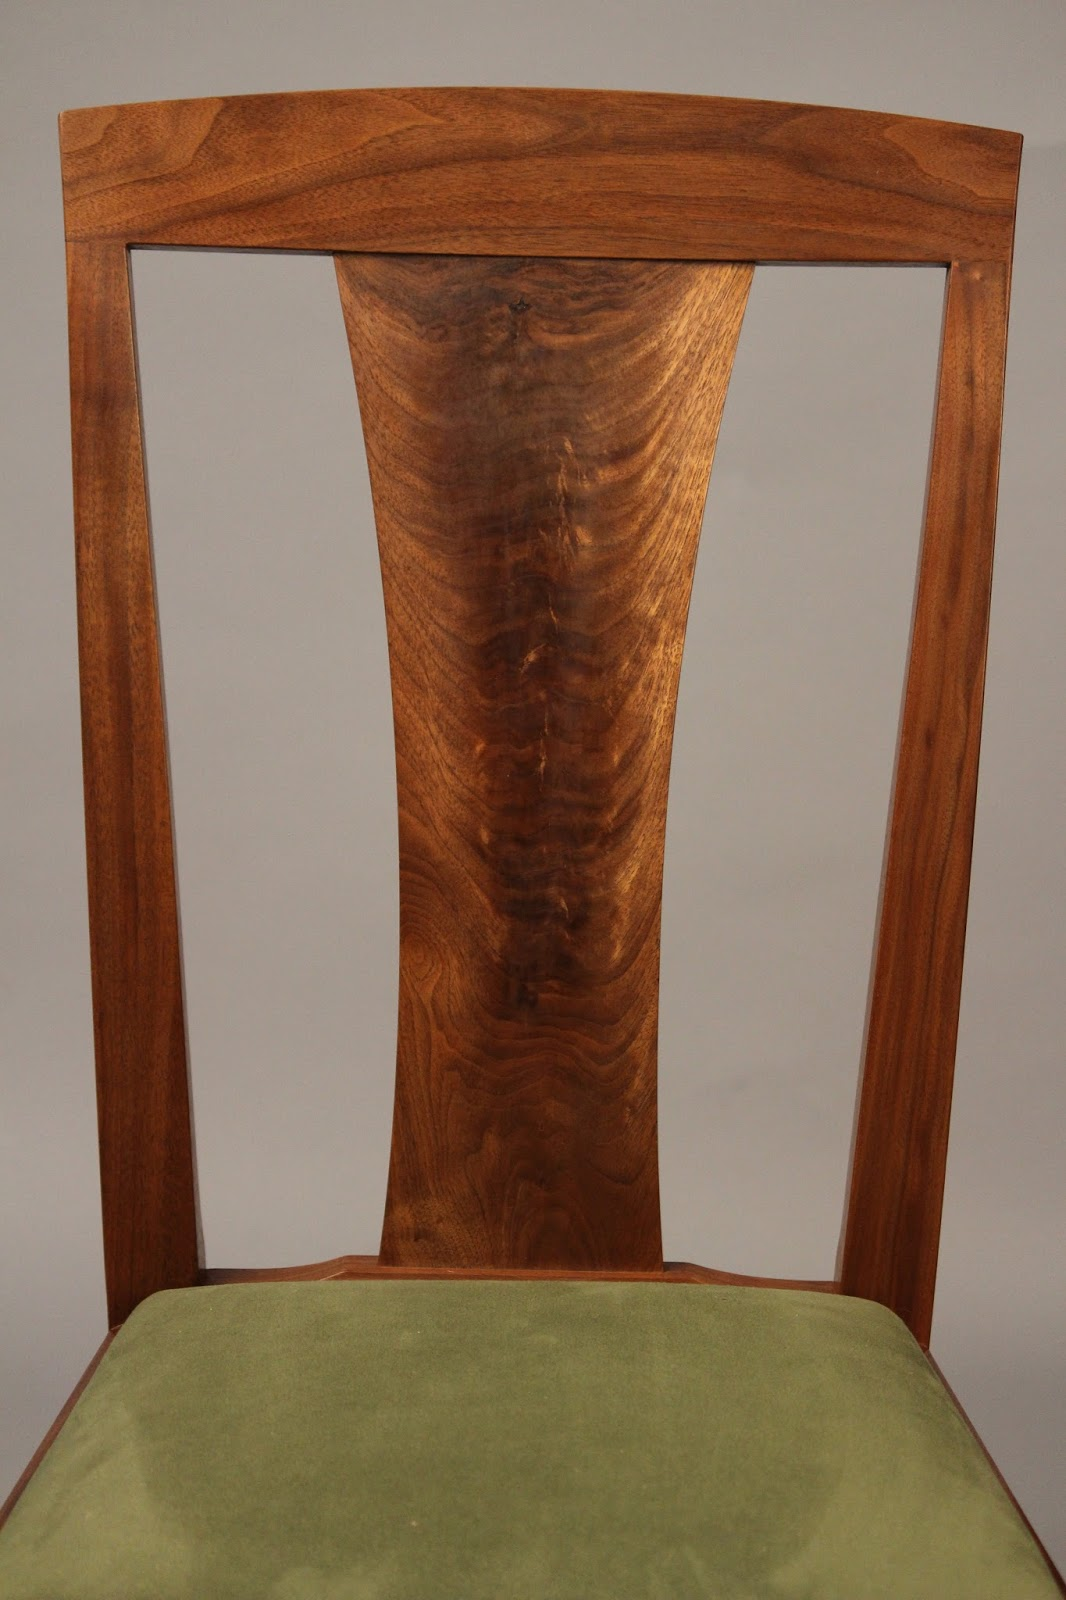 matthew wolfe chair maker